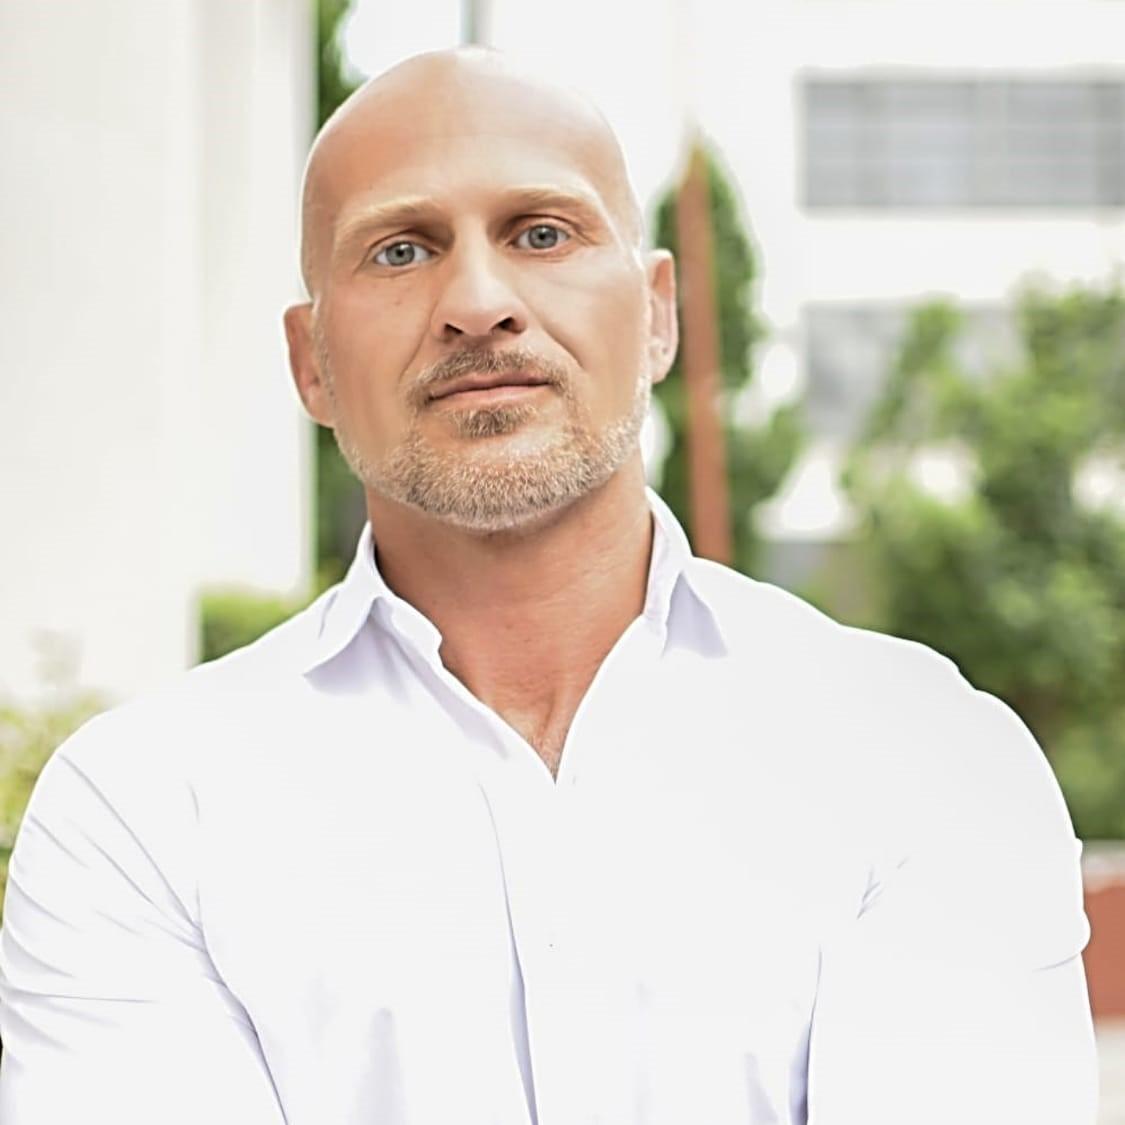 Dr. Fabio Fanfoni